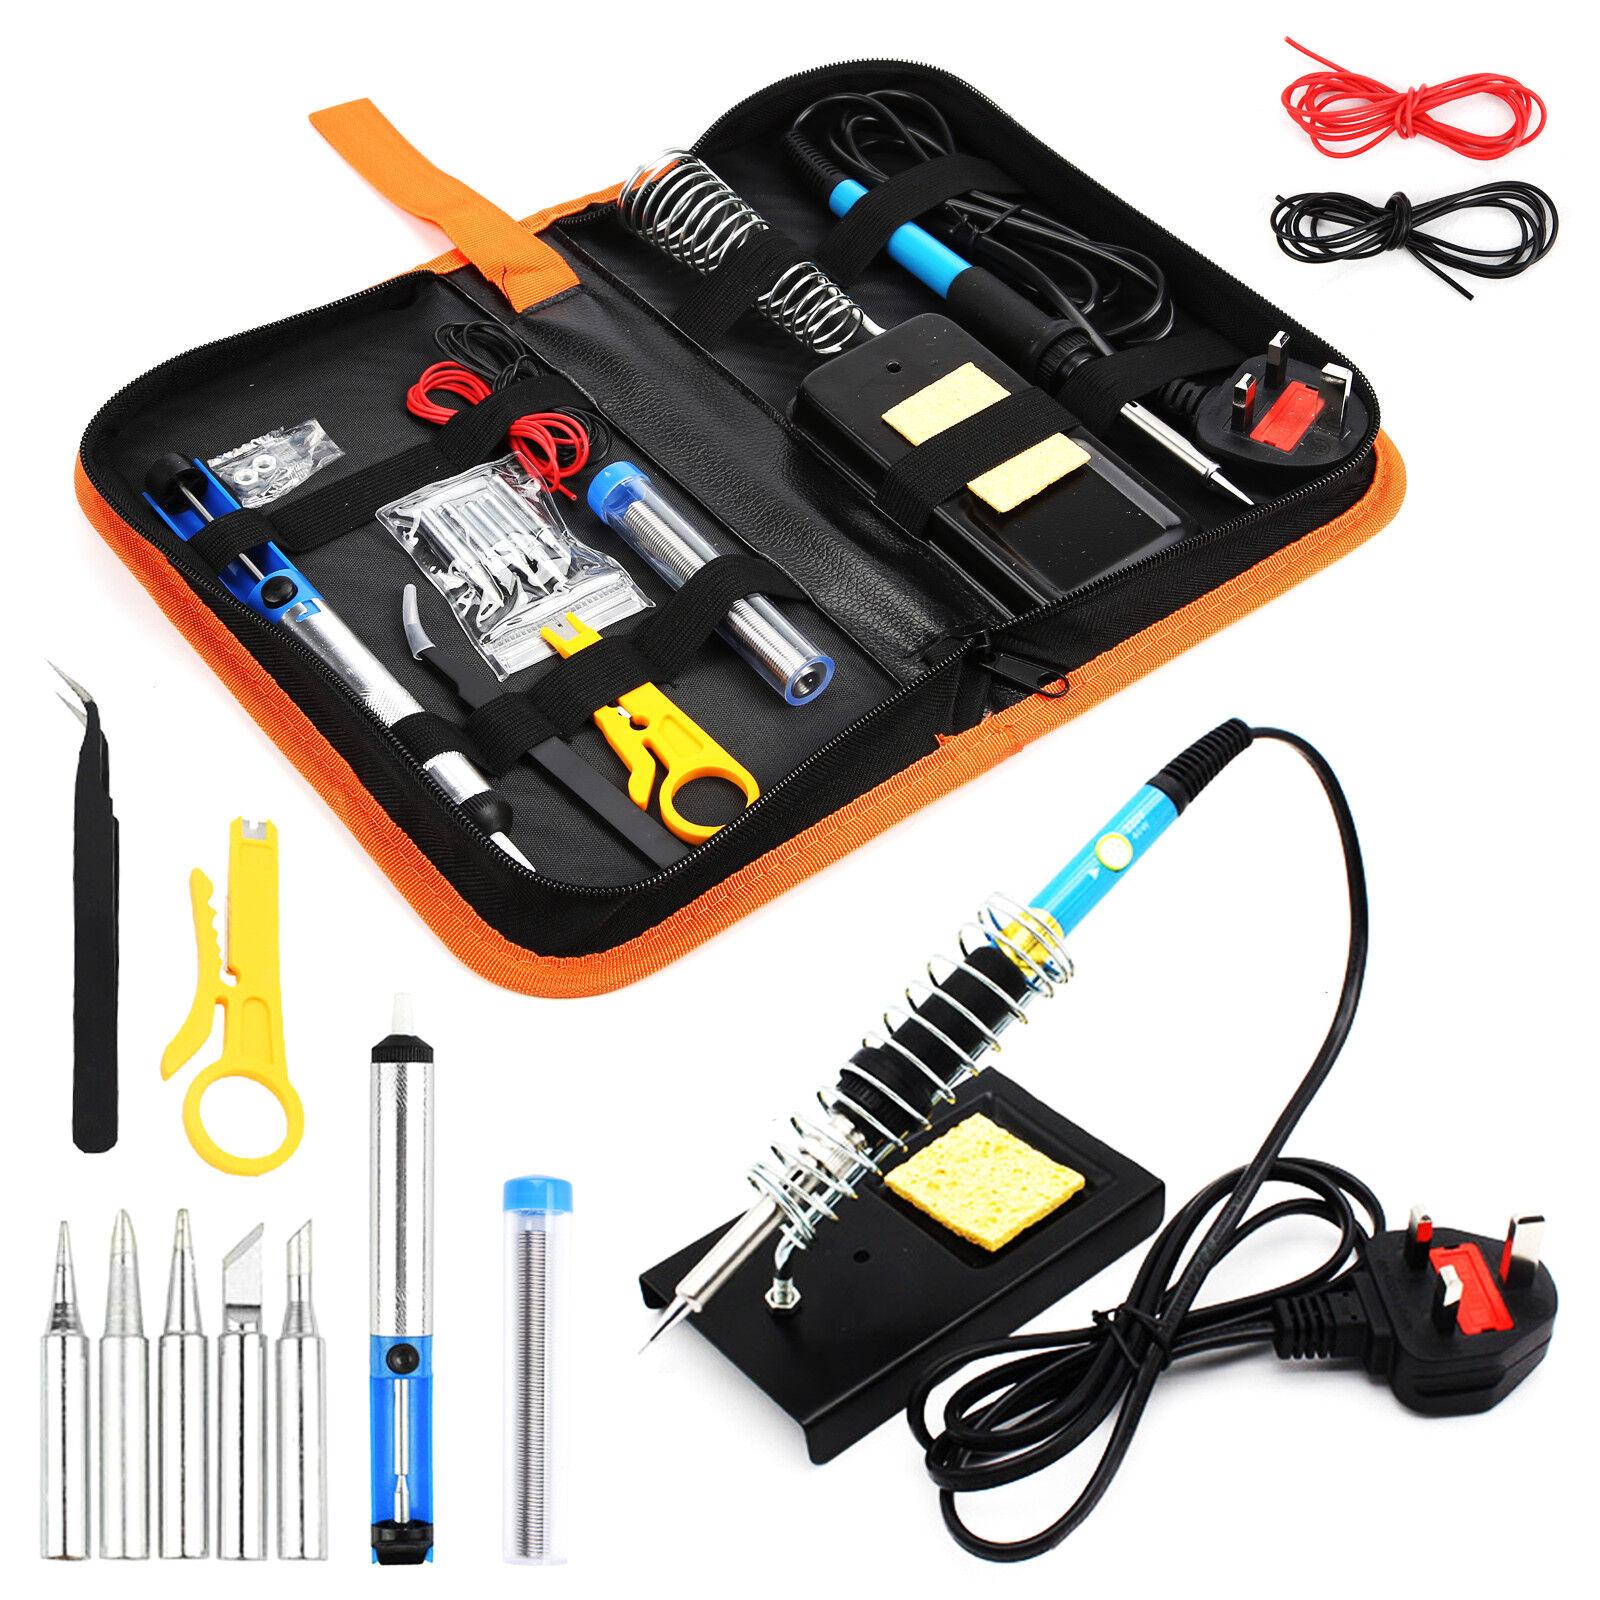 60W Soldering Iron Kit Electronics Welding Irons Solder Tools Adjustable Temp UK